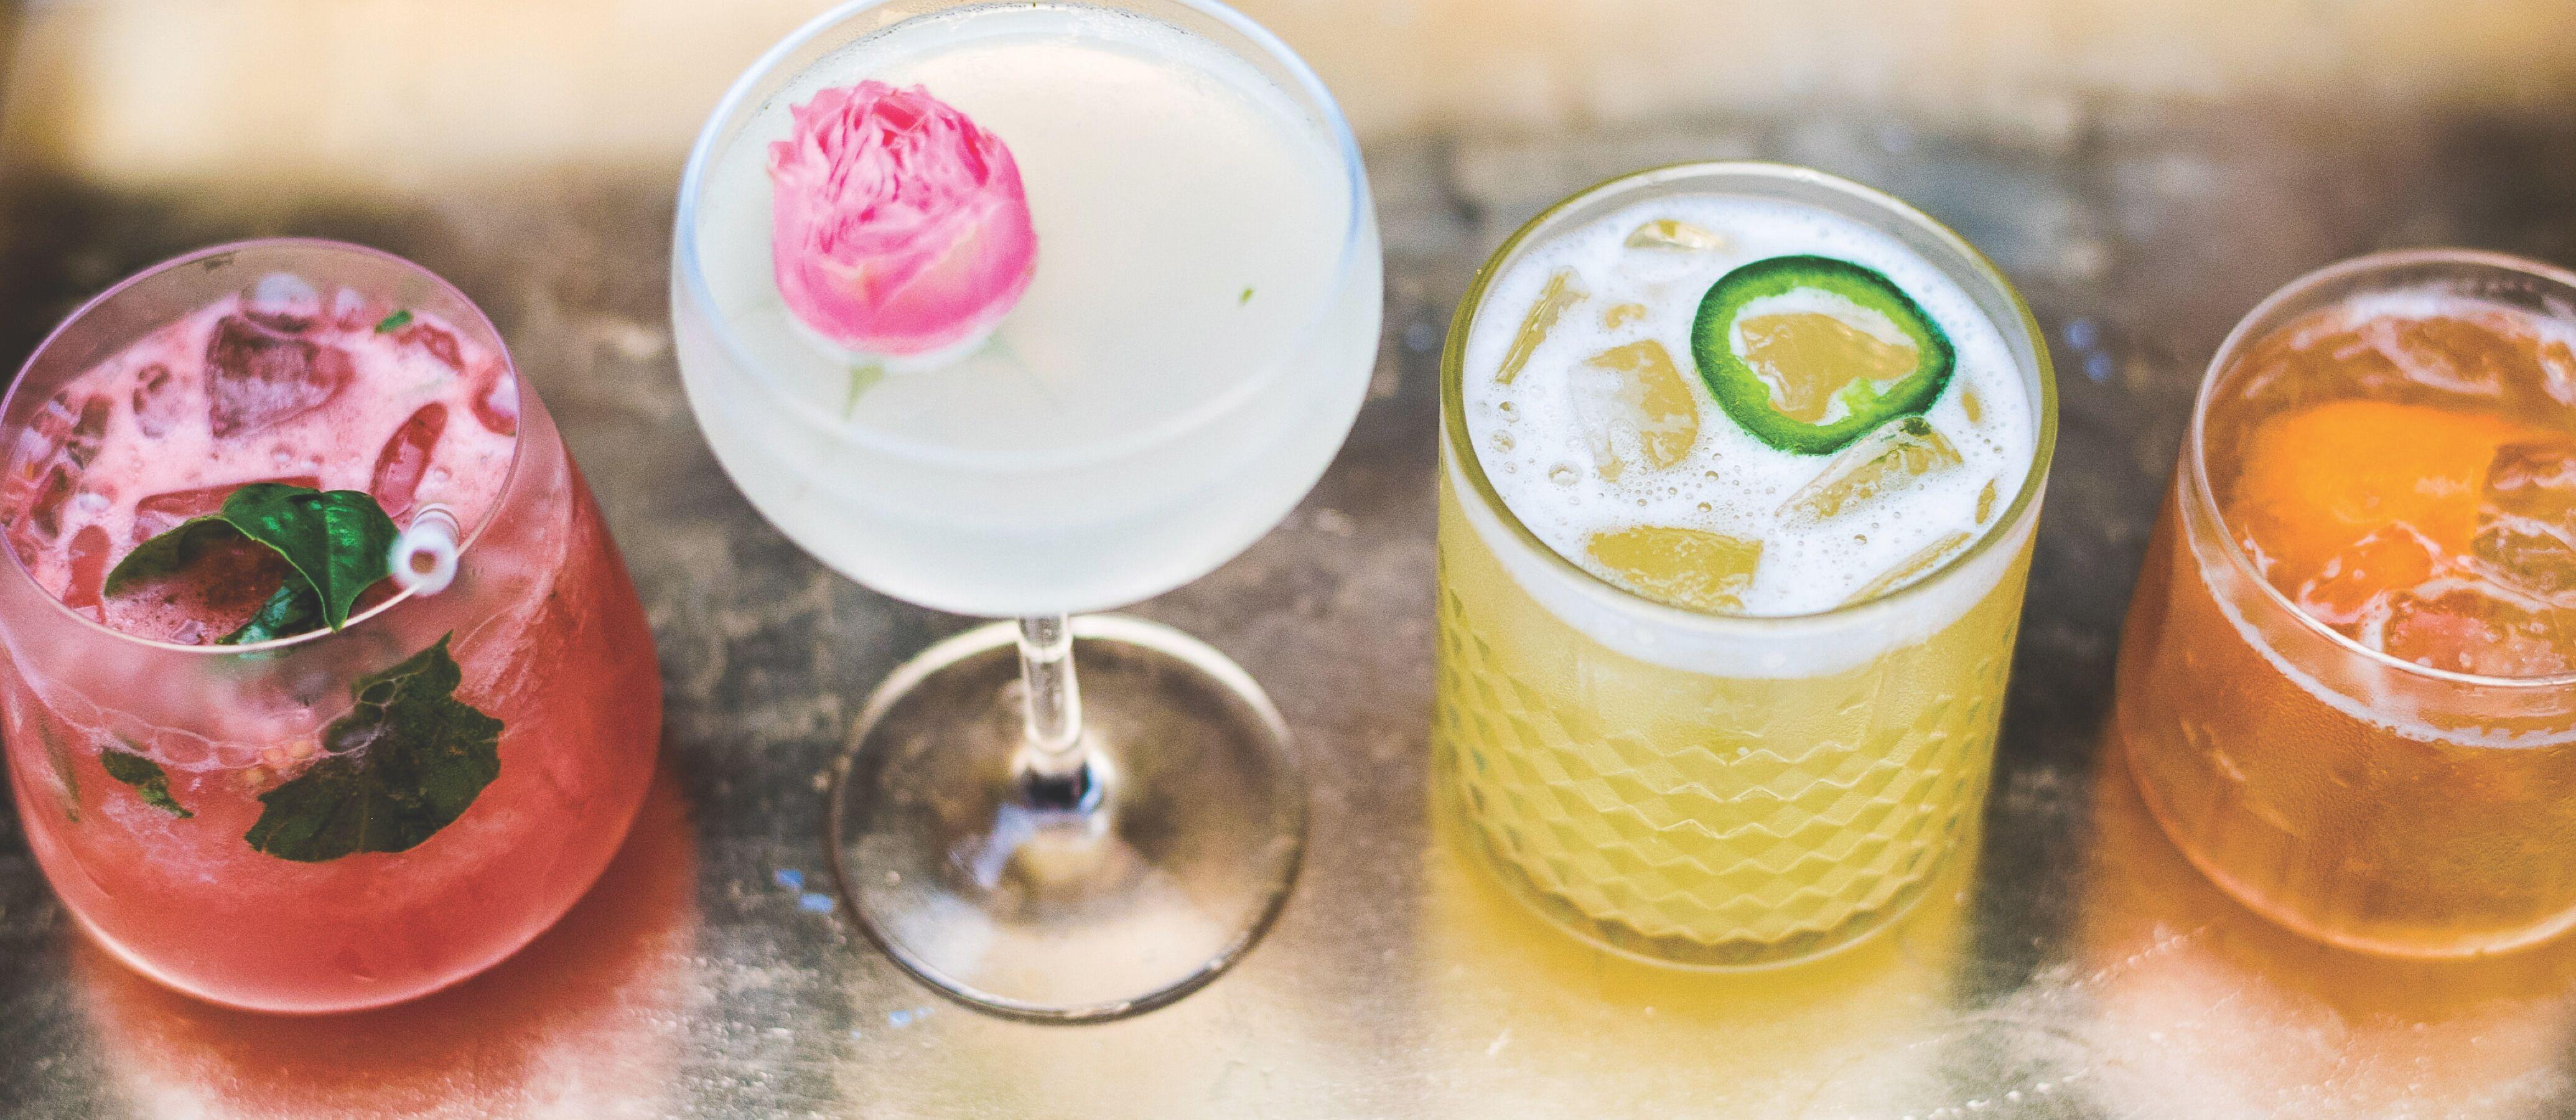 bar service & beverage